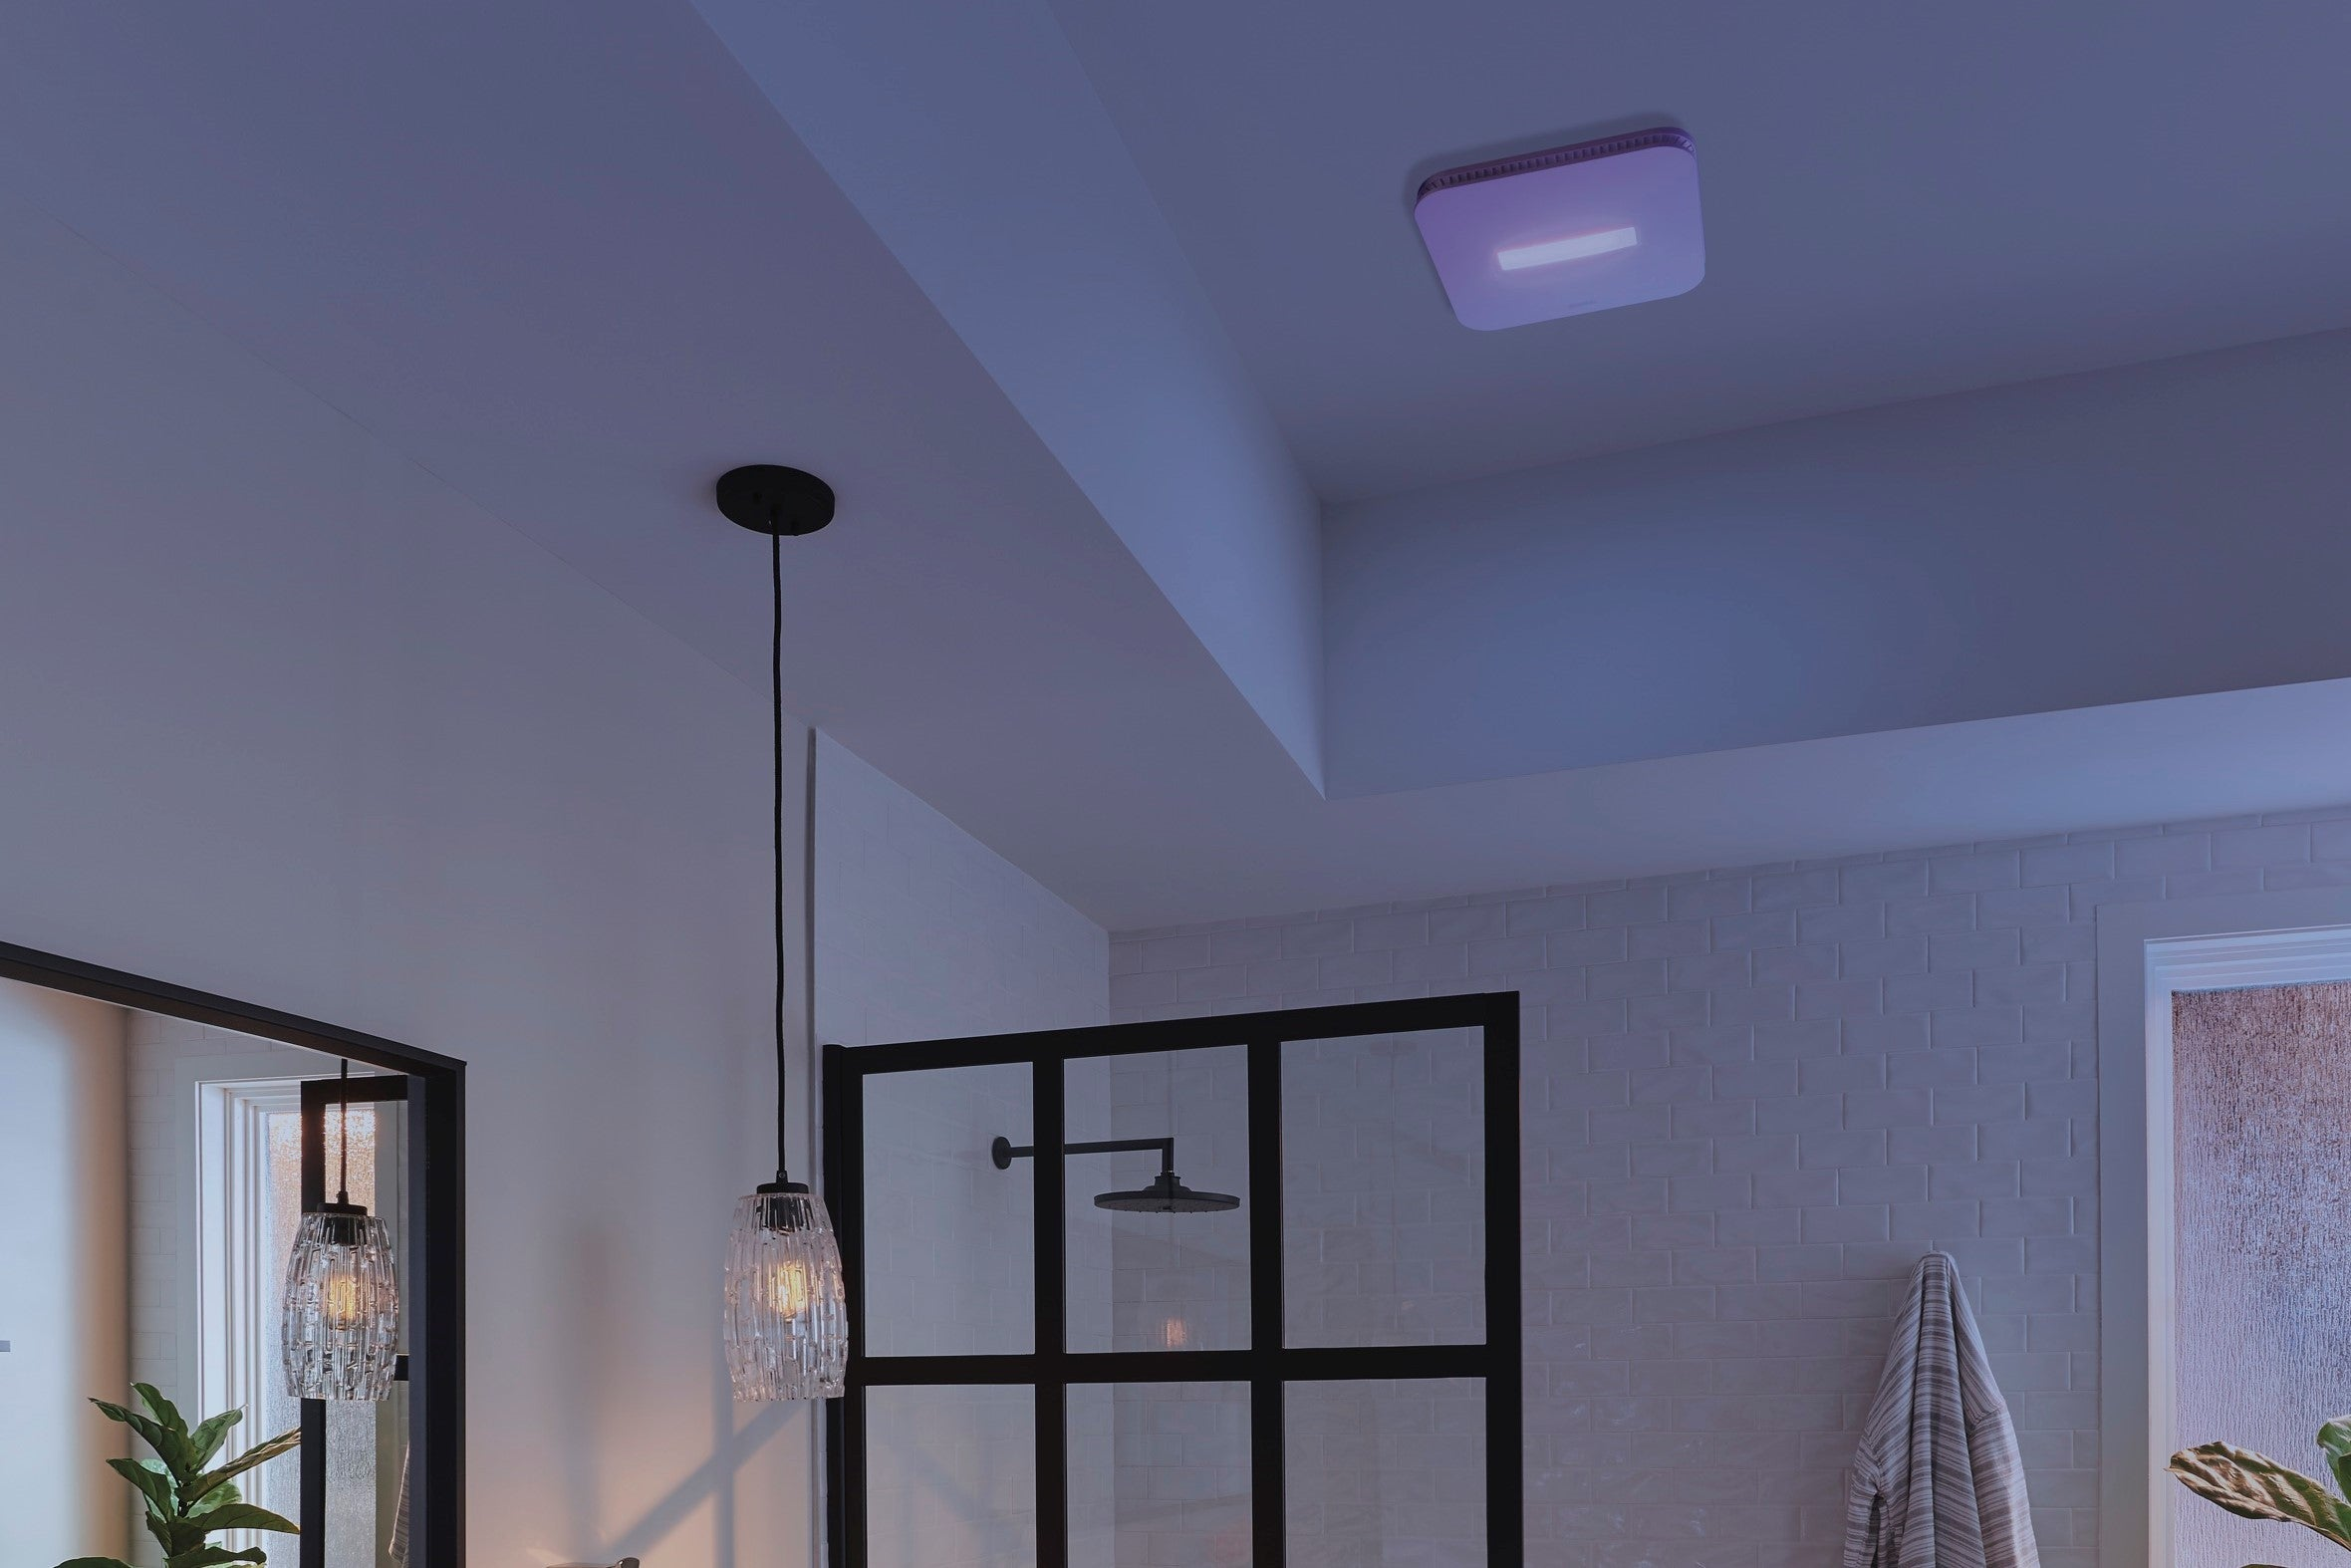 Broan S Upcoming Surfaceshield Bathroom Fan Kills Germs